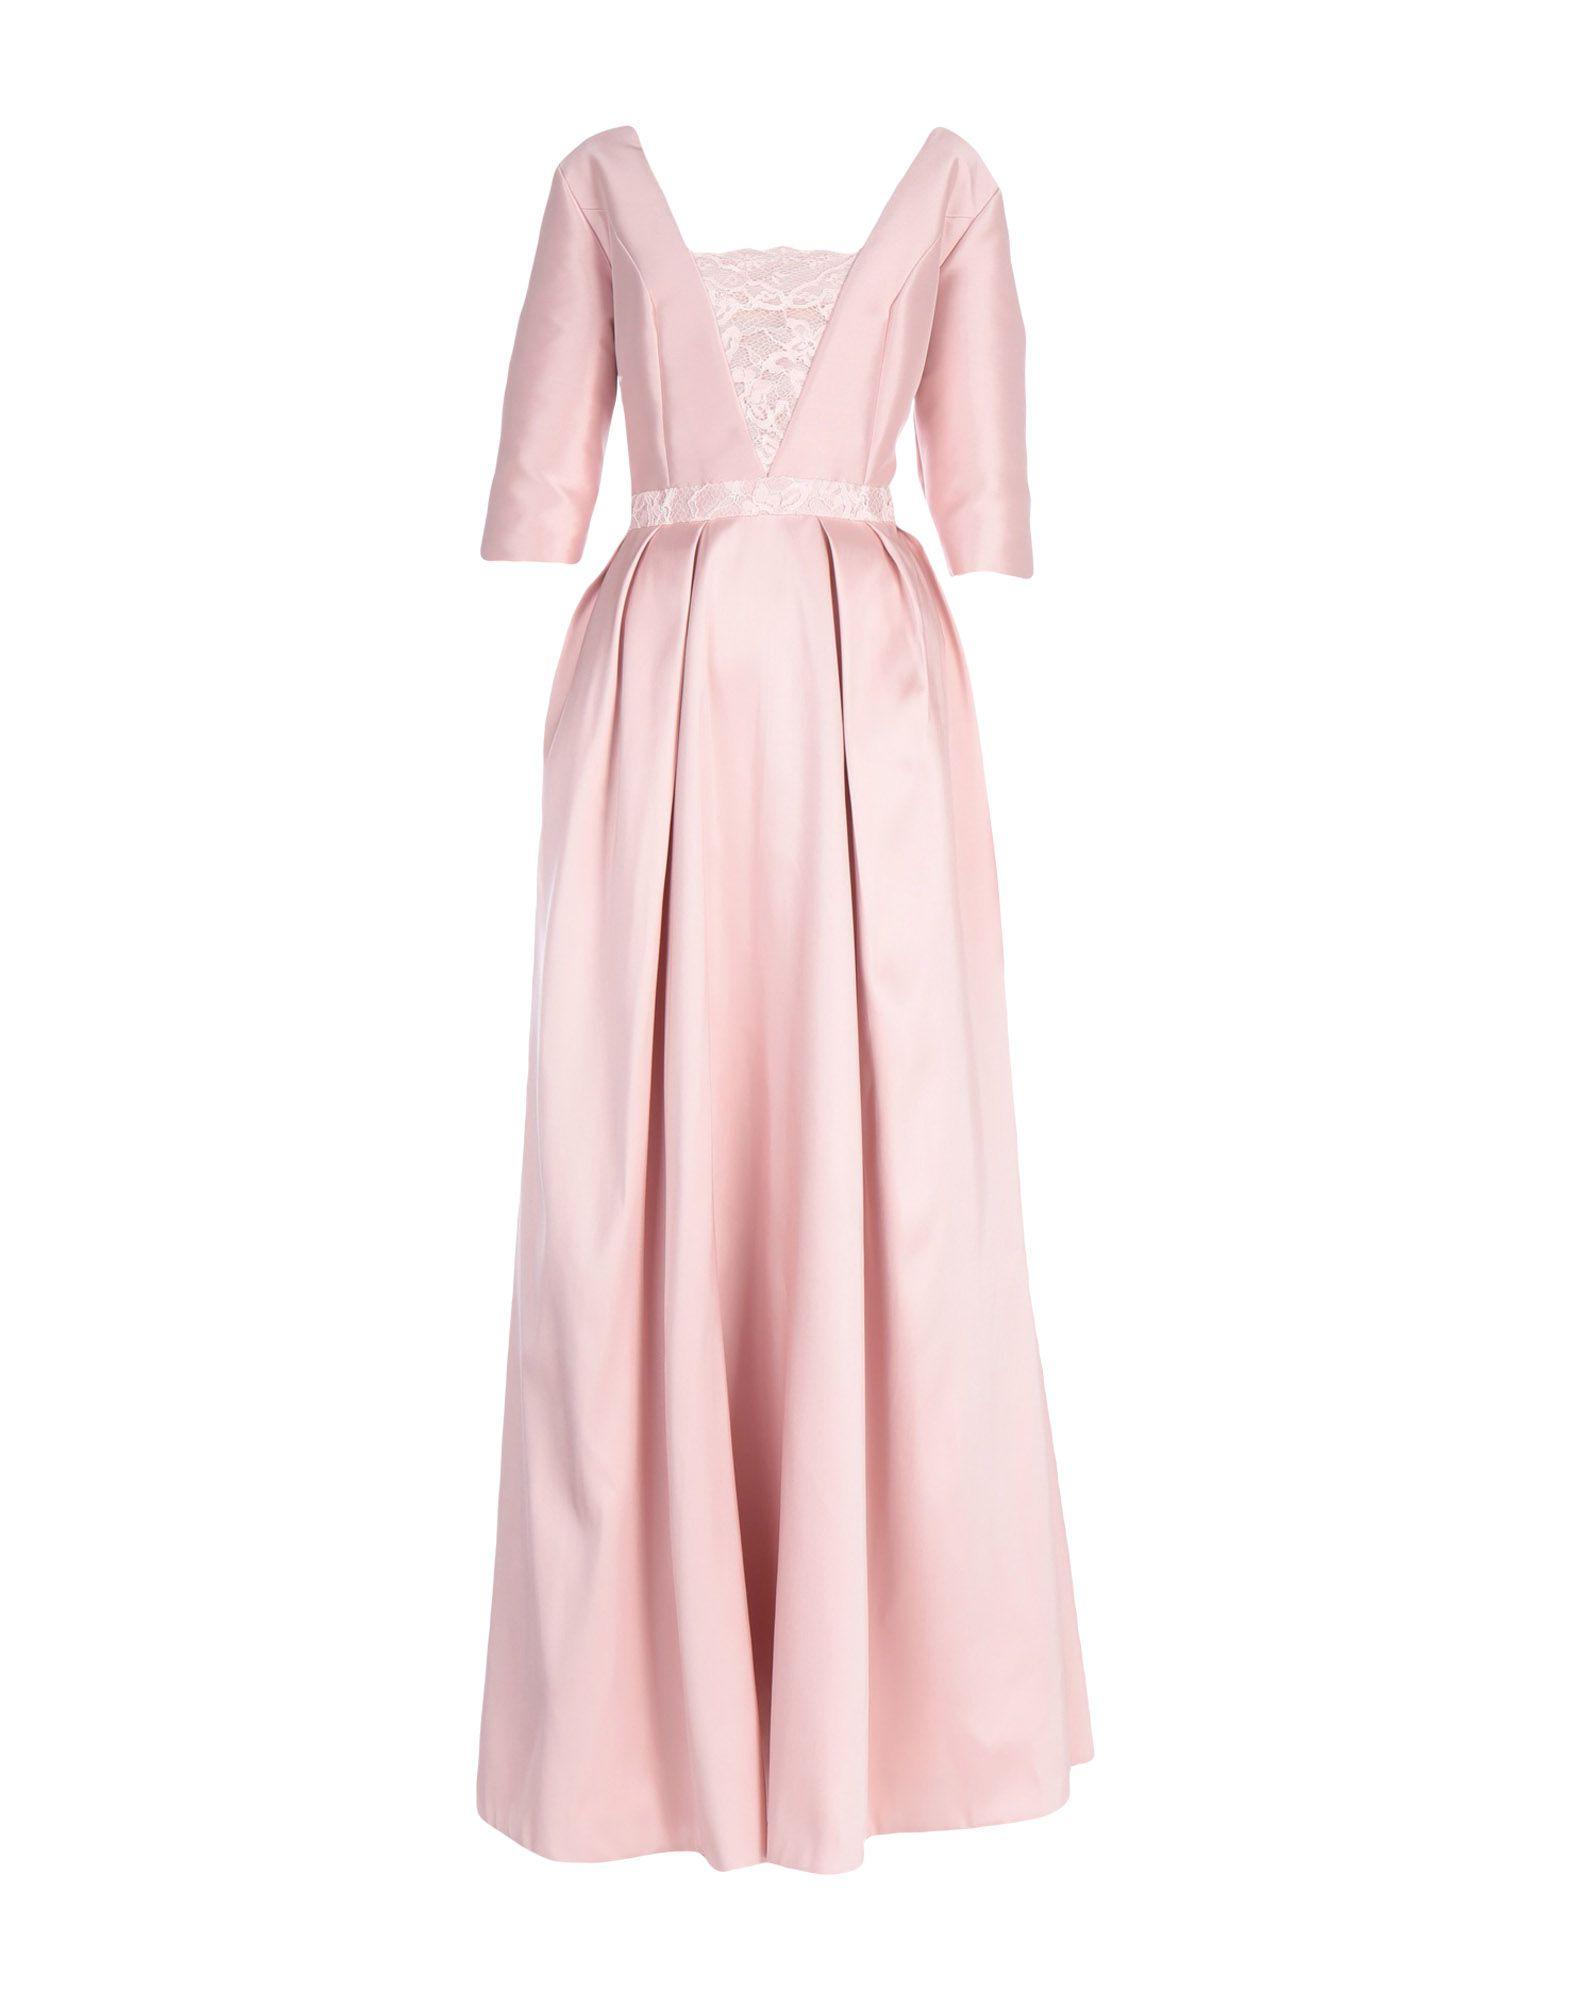 ALEX VIDAL Длинное платье платье alex lu alex lu mp002xw1f8wv